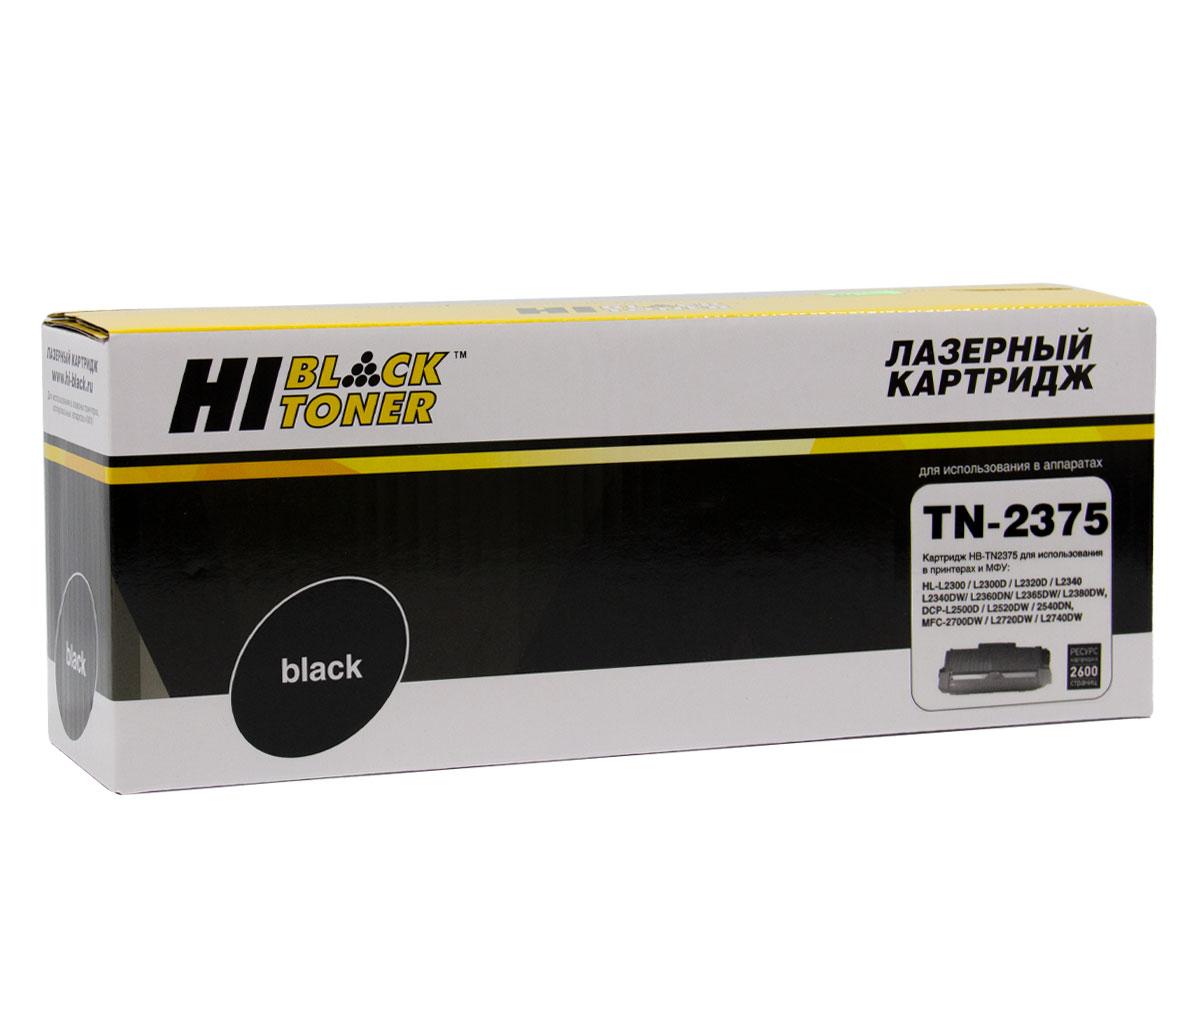 Тонер-картридж Hi-Black (HB-TN-2375/TN-2335) для Brother HL-L2300/2305/2320/2340/2360,2,6K